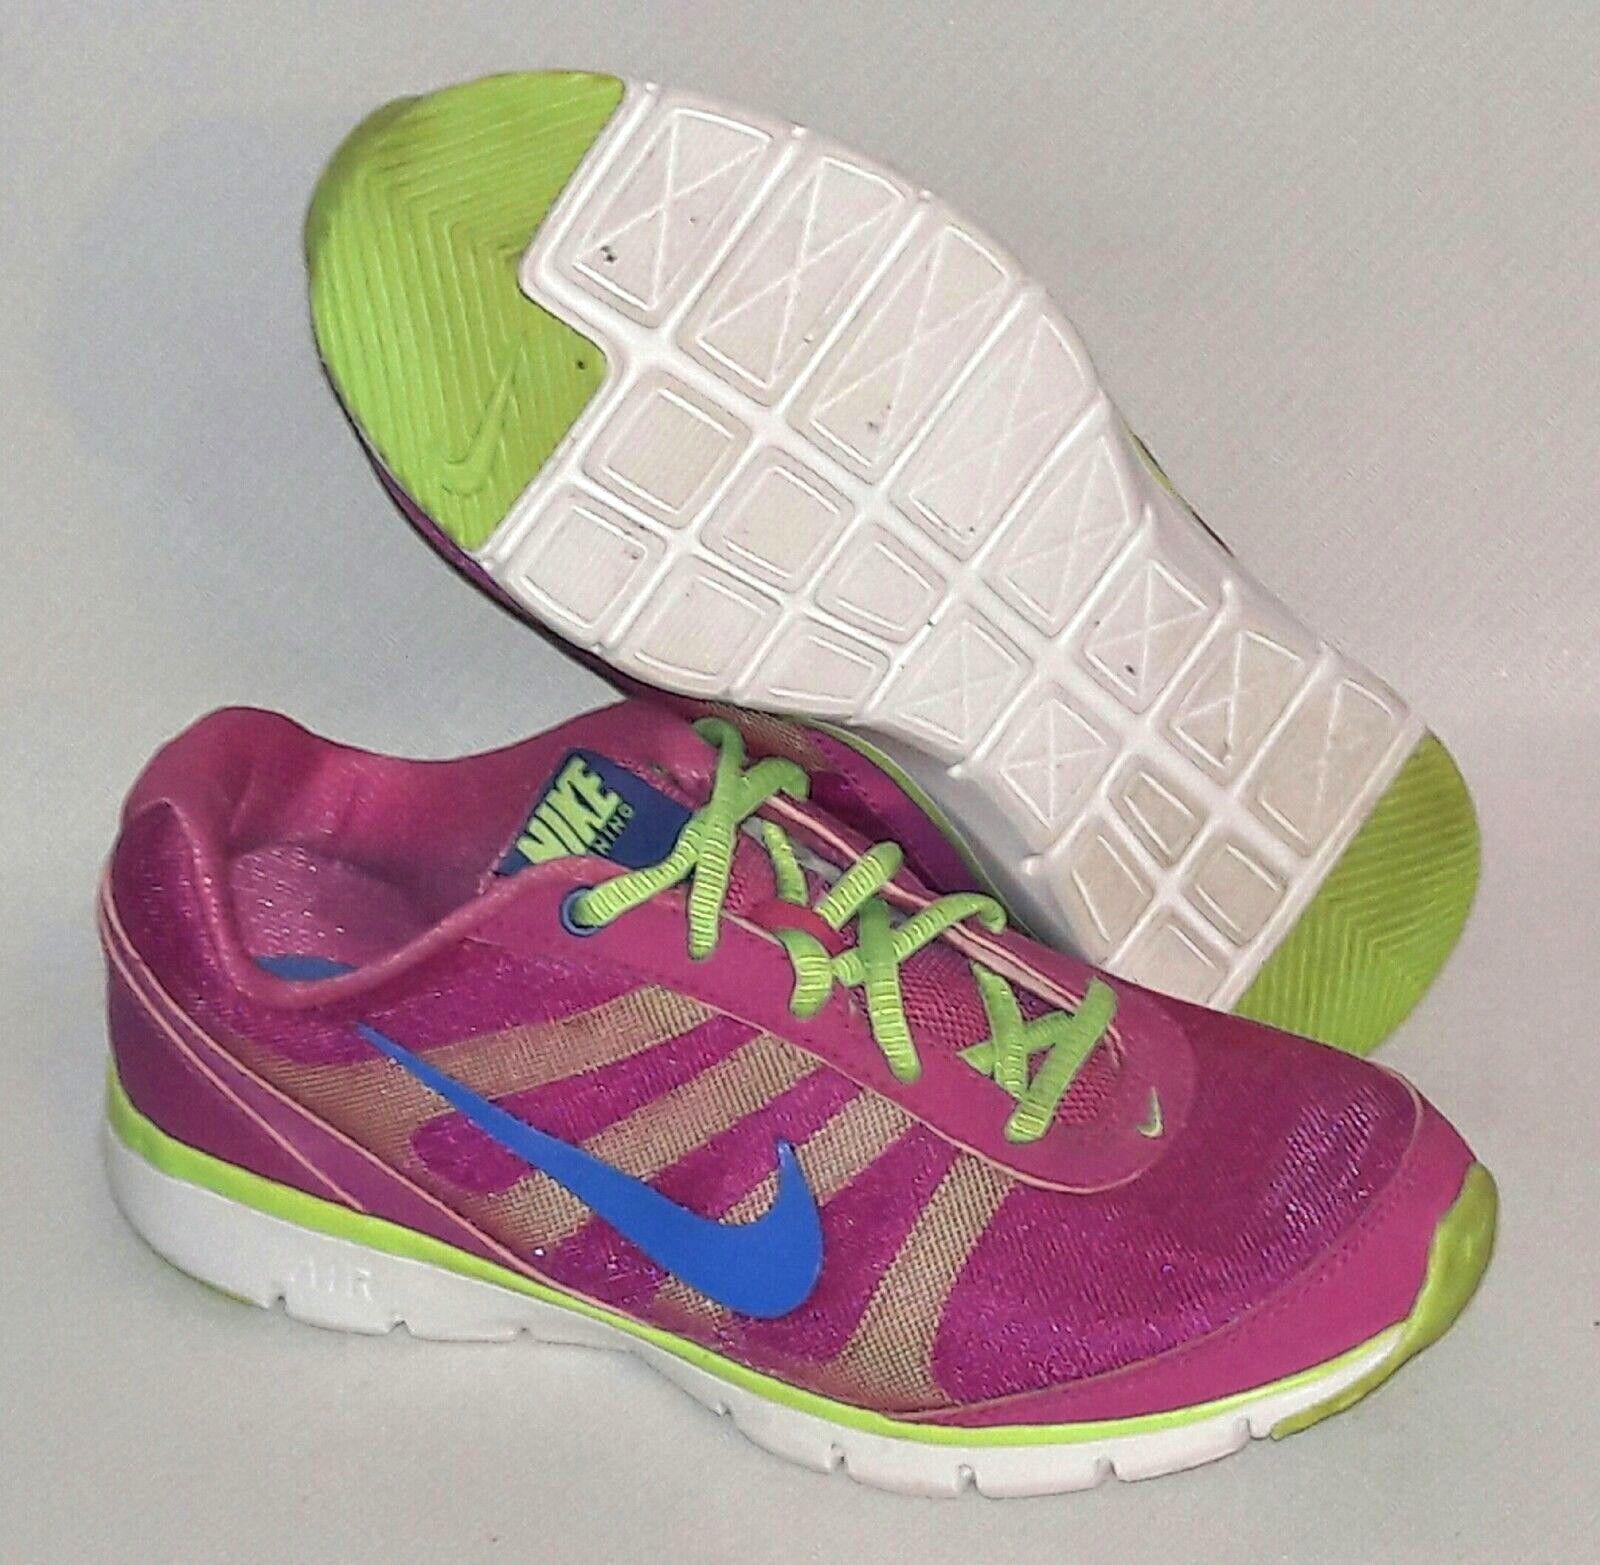 nike air donne sz 7 formazione scarpe da corsa 4488111 4488111 4488111 totale nucleo blu giallorosa 556e06